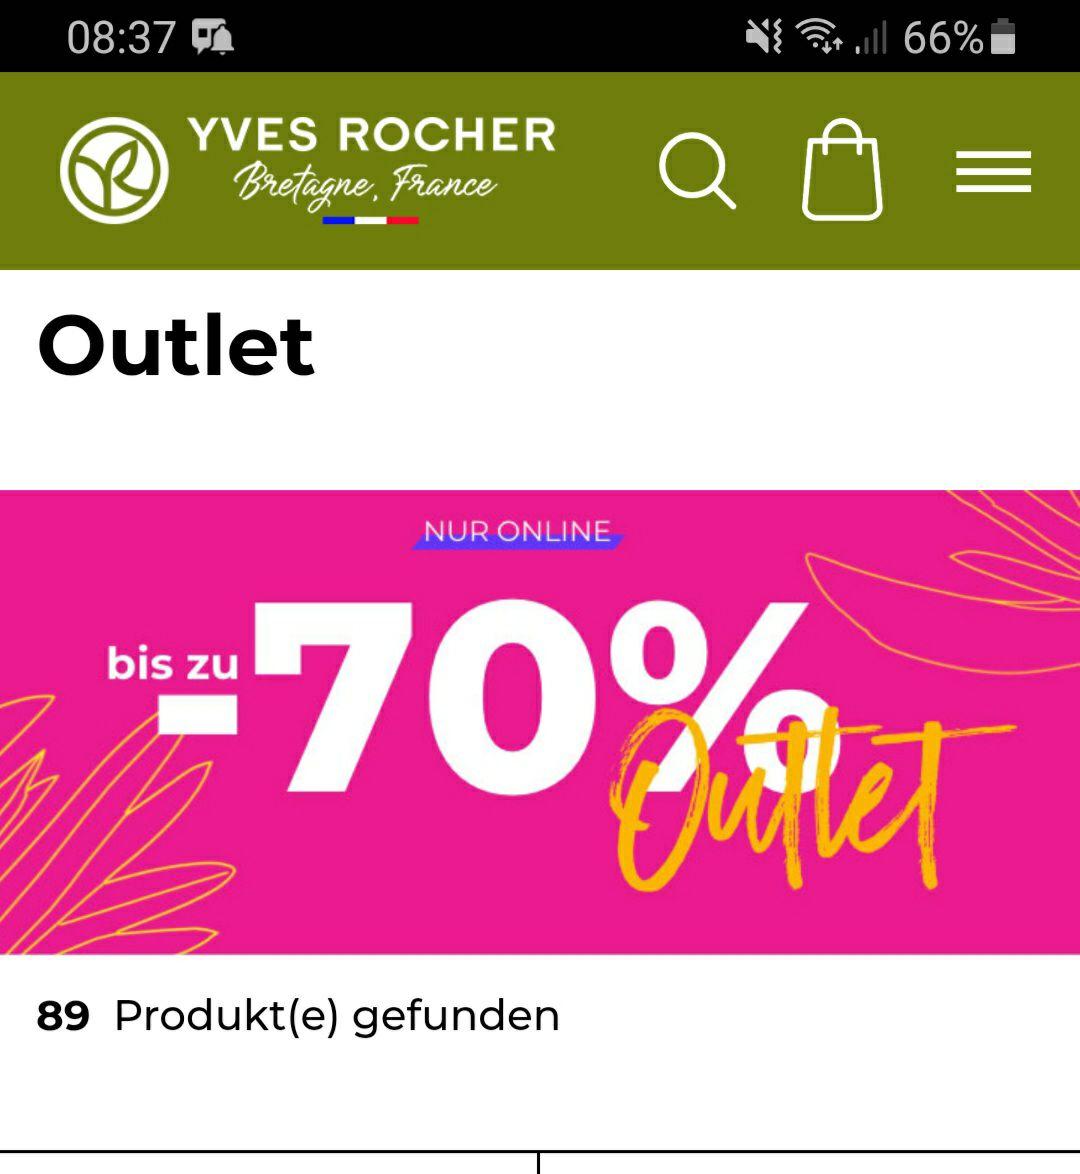 Bis zu -70% Outlet bei Yves Rocher